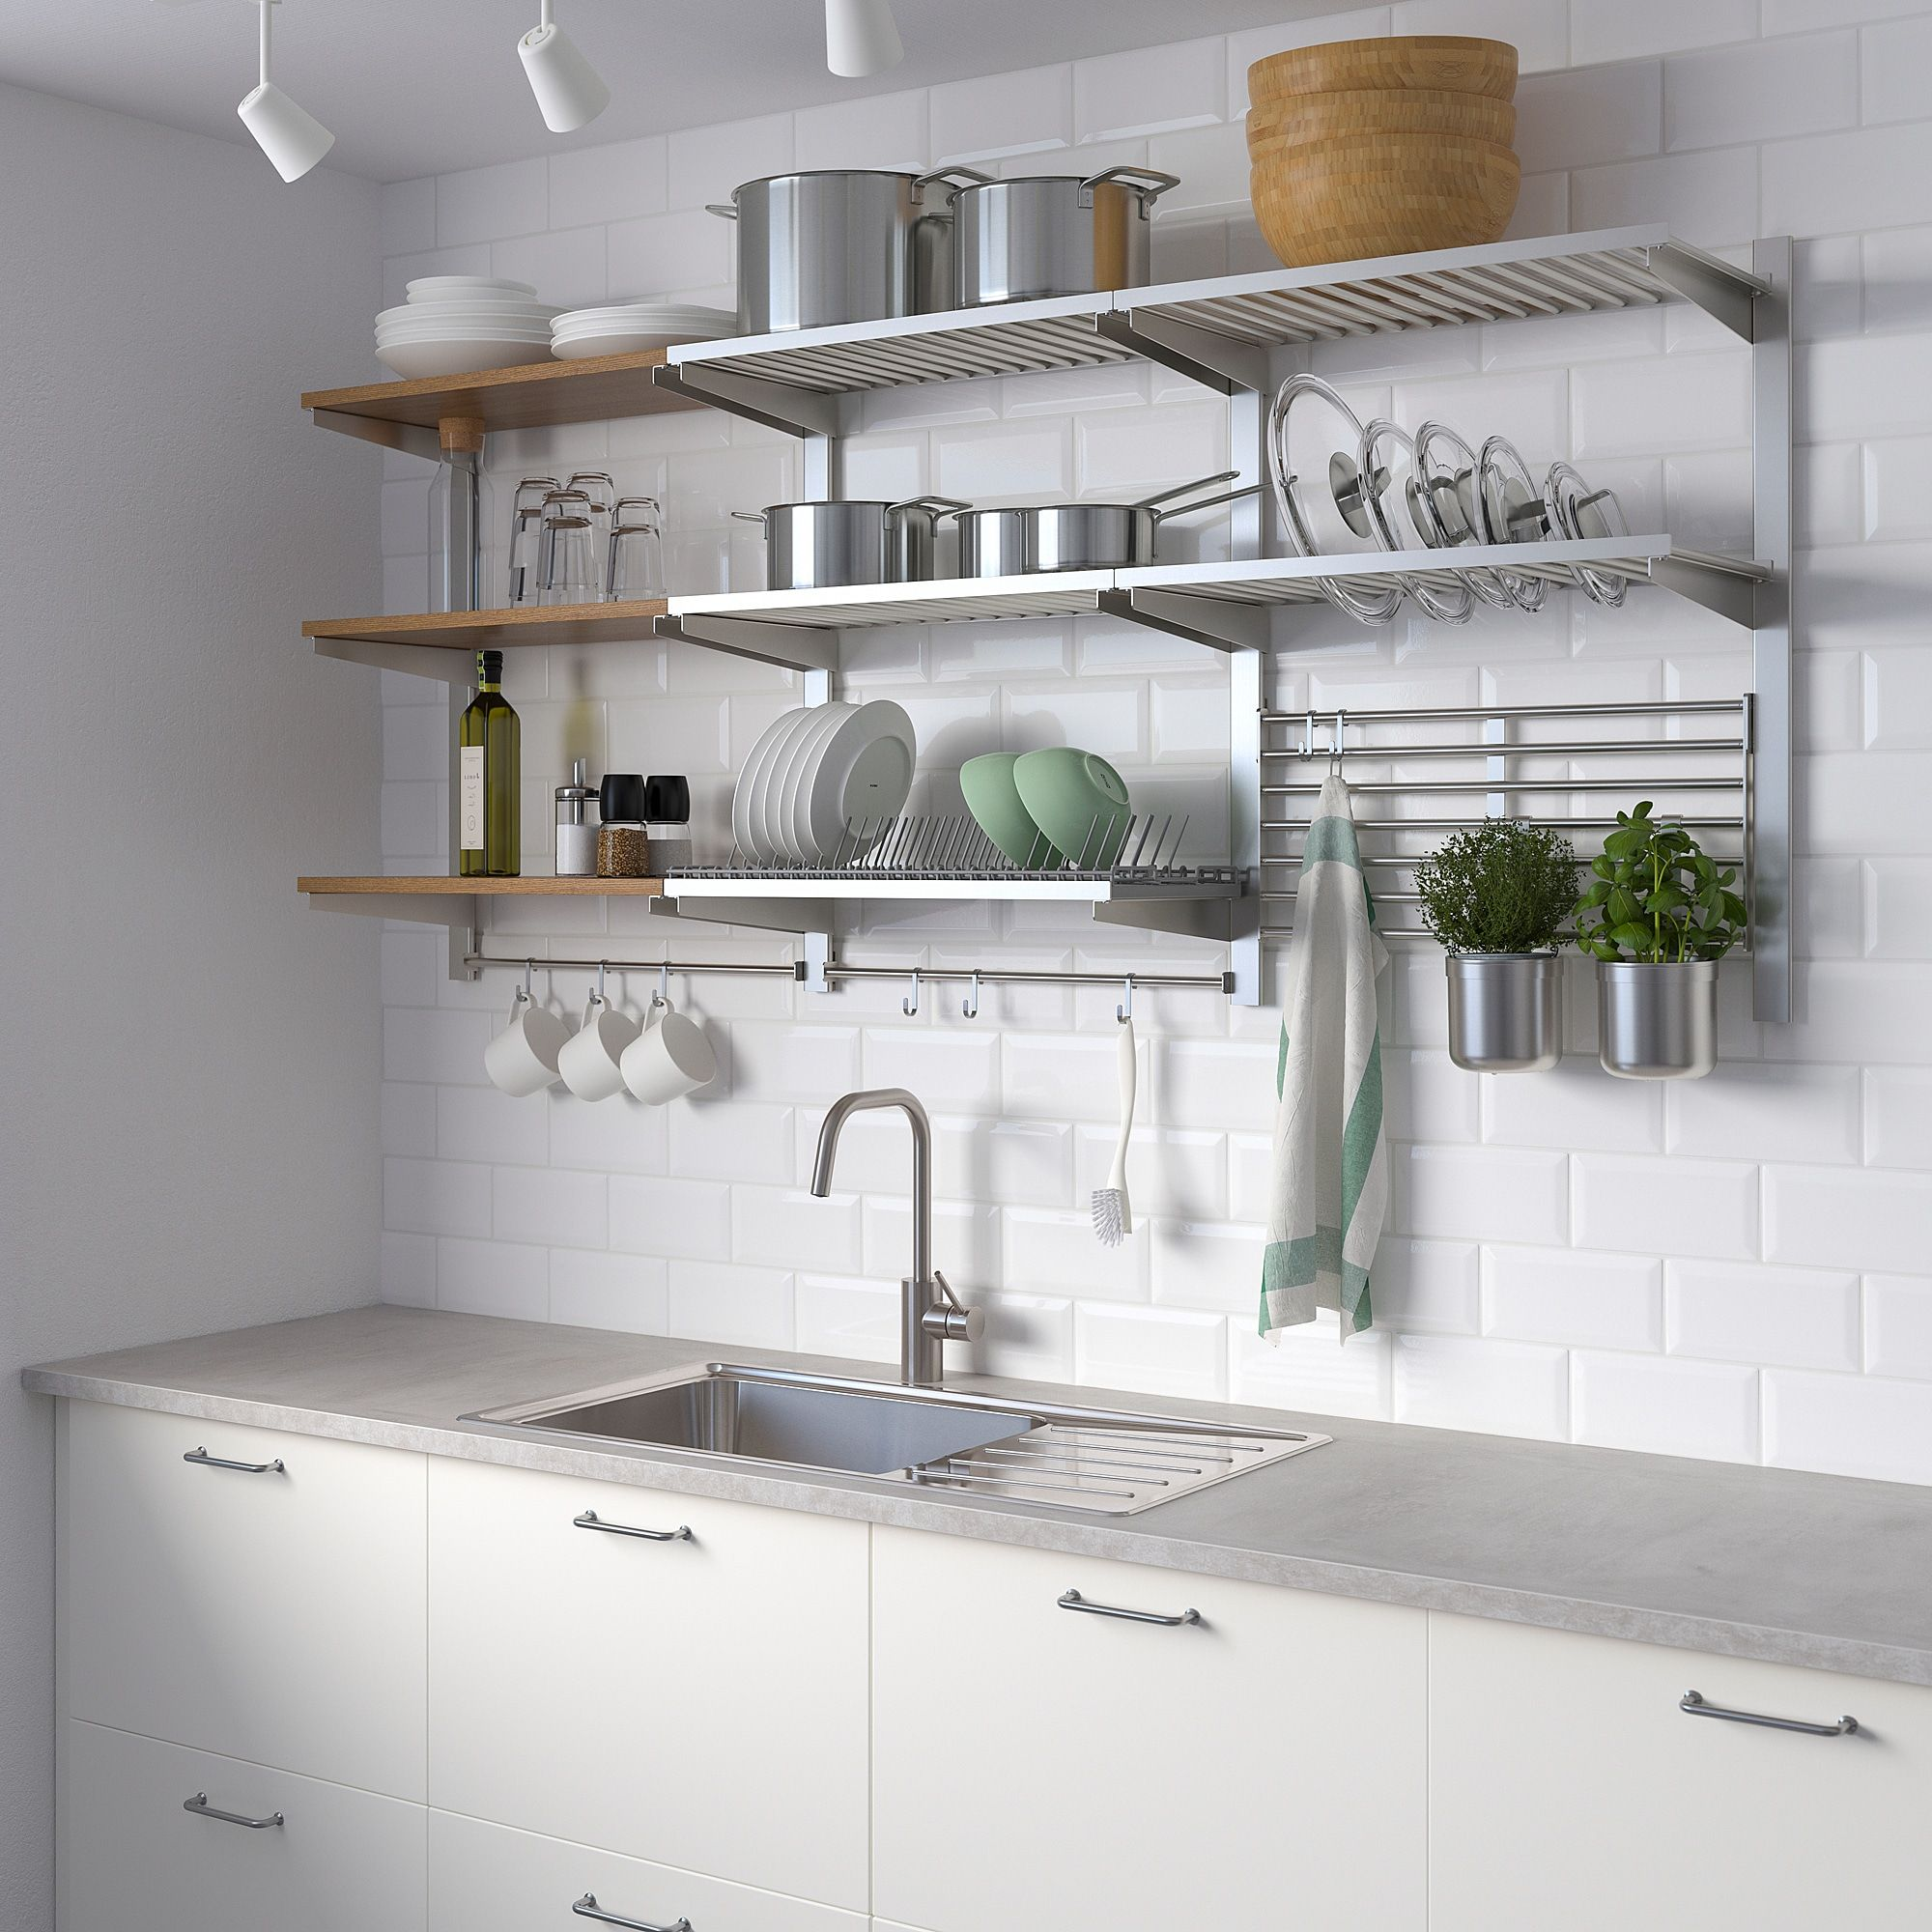 Ikea Kungsfors Susp Rail Shlf Dish Dra Rail Wll Gr Kitchen Remodel Kitchen Cabinets Kitchen Design